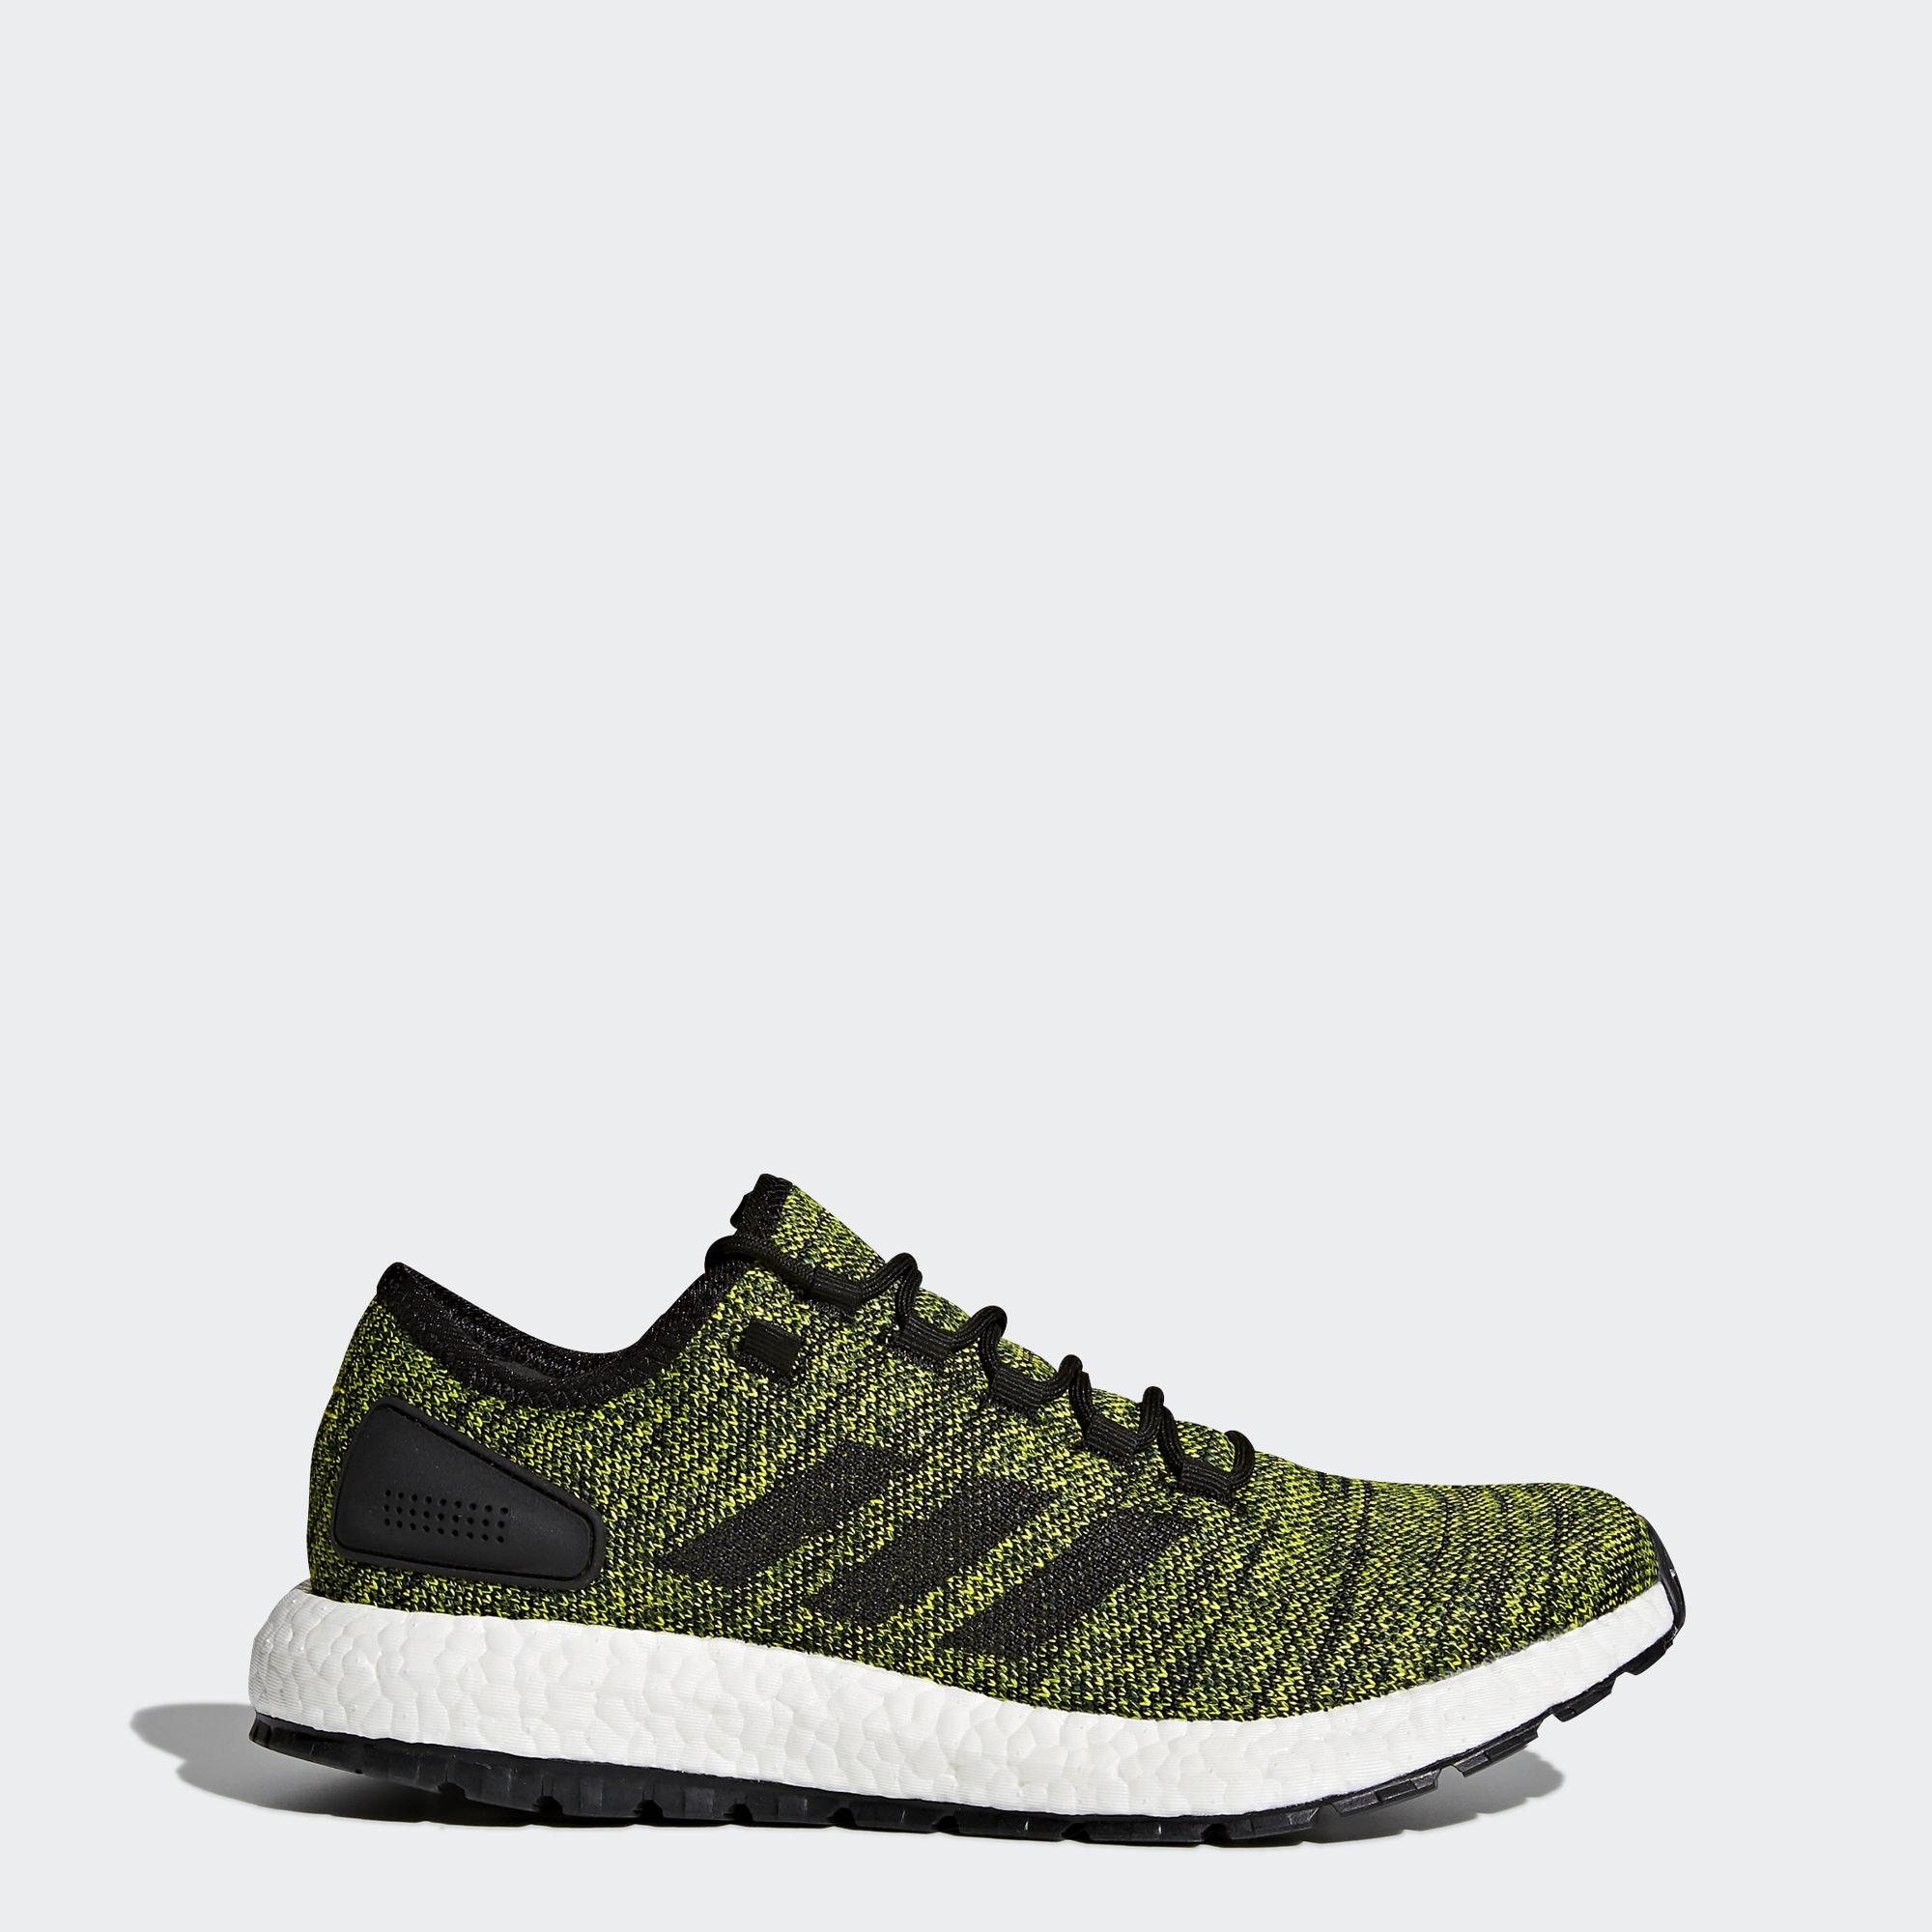 Adidas Pureboost All Terrain Shoe - Mens Green $60